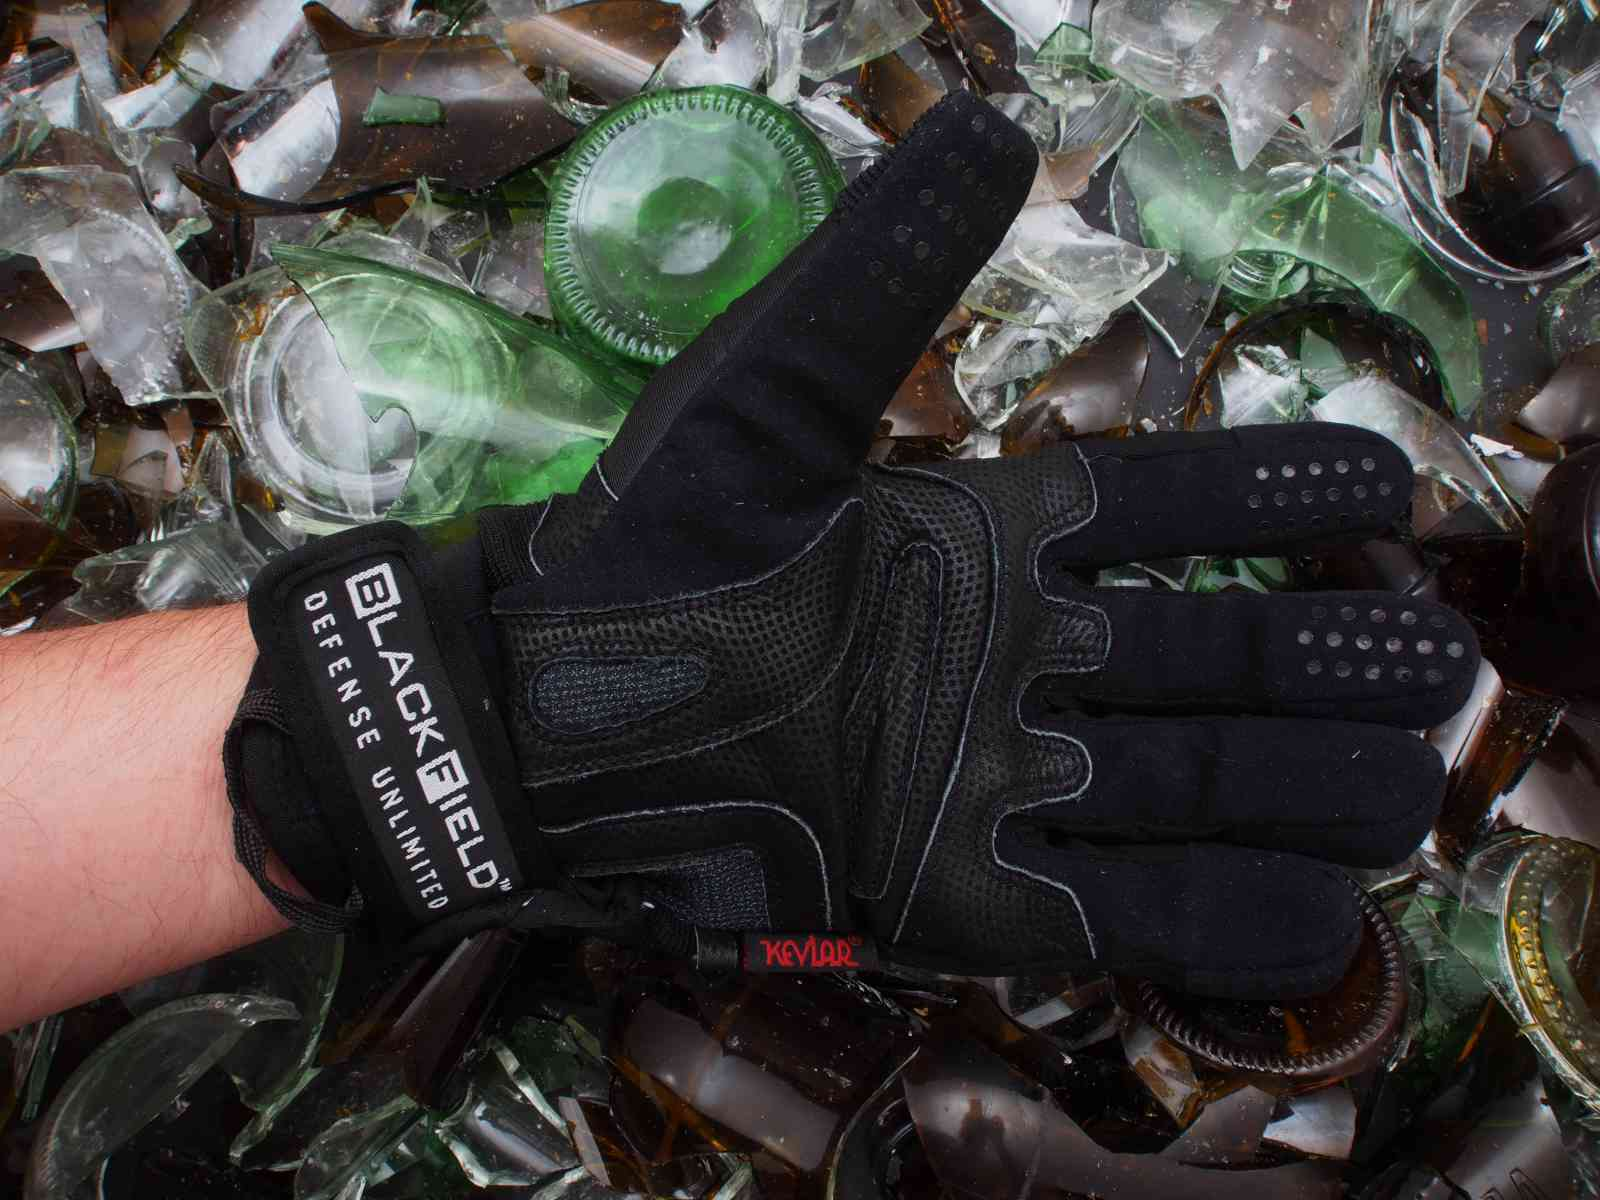 Blackfield Protector - Handinnenseite